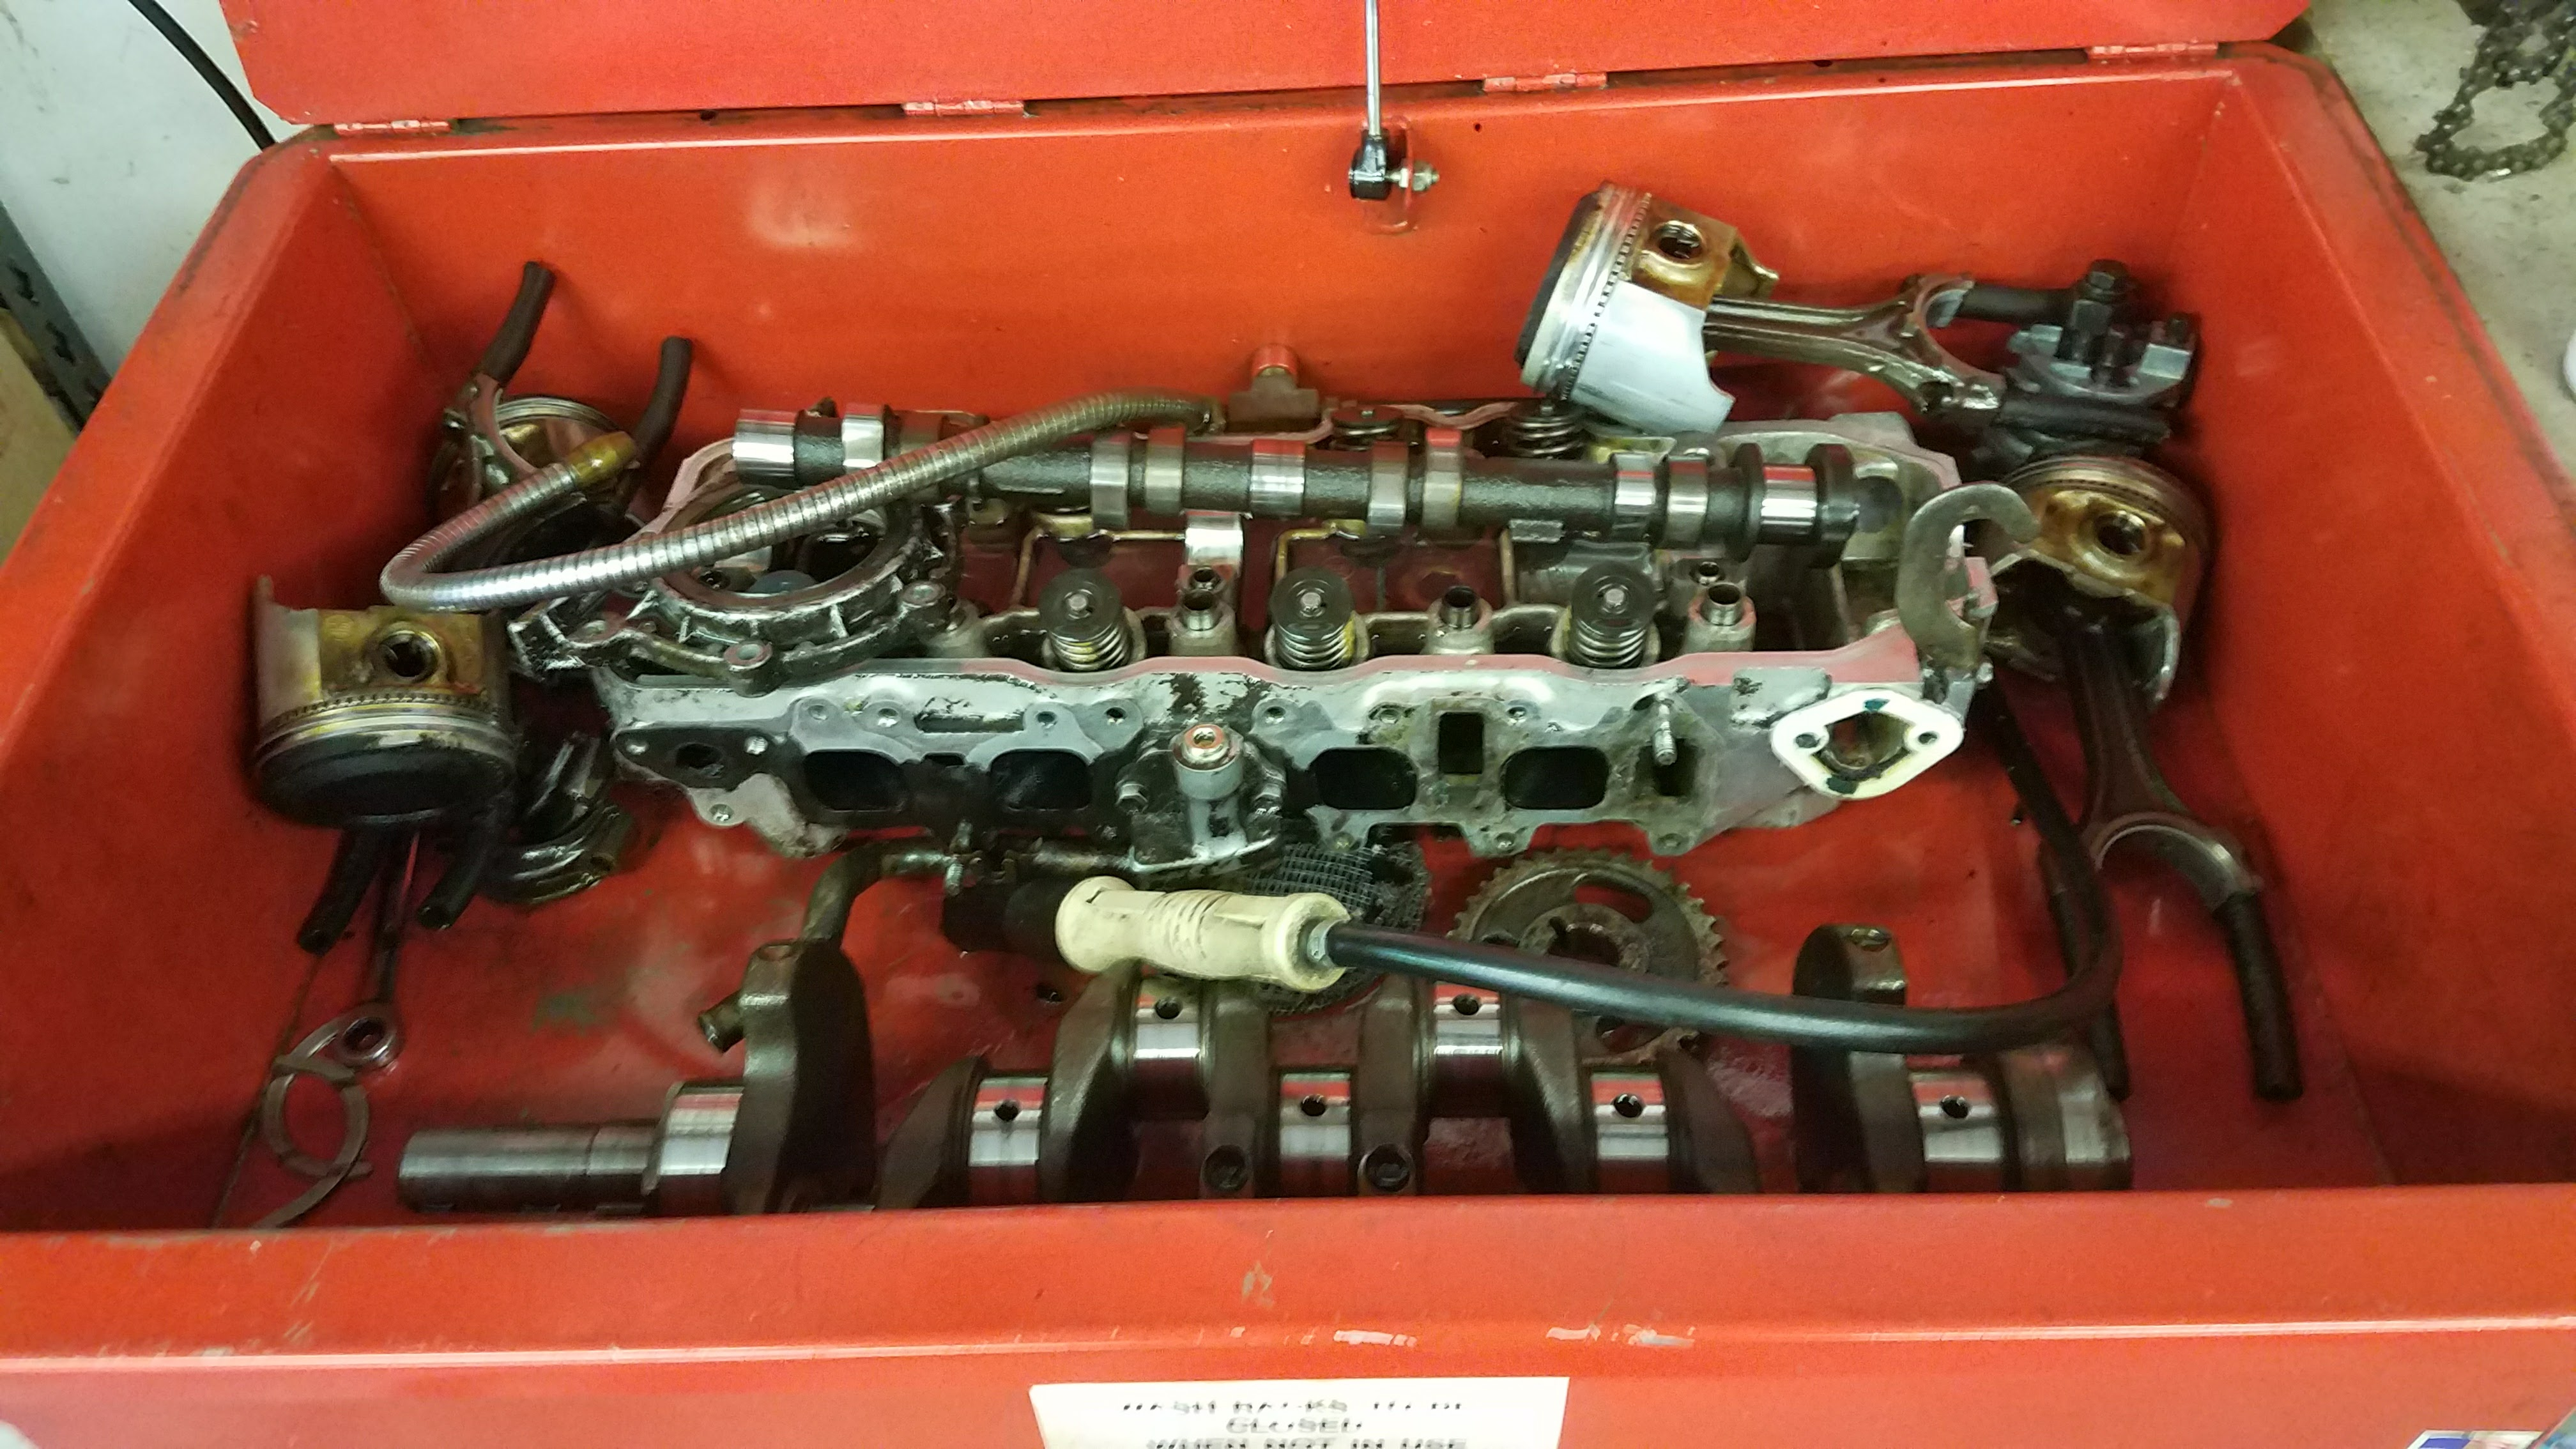 22R Engine Rebuild | Squat the Planet